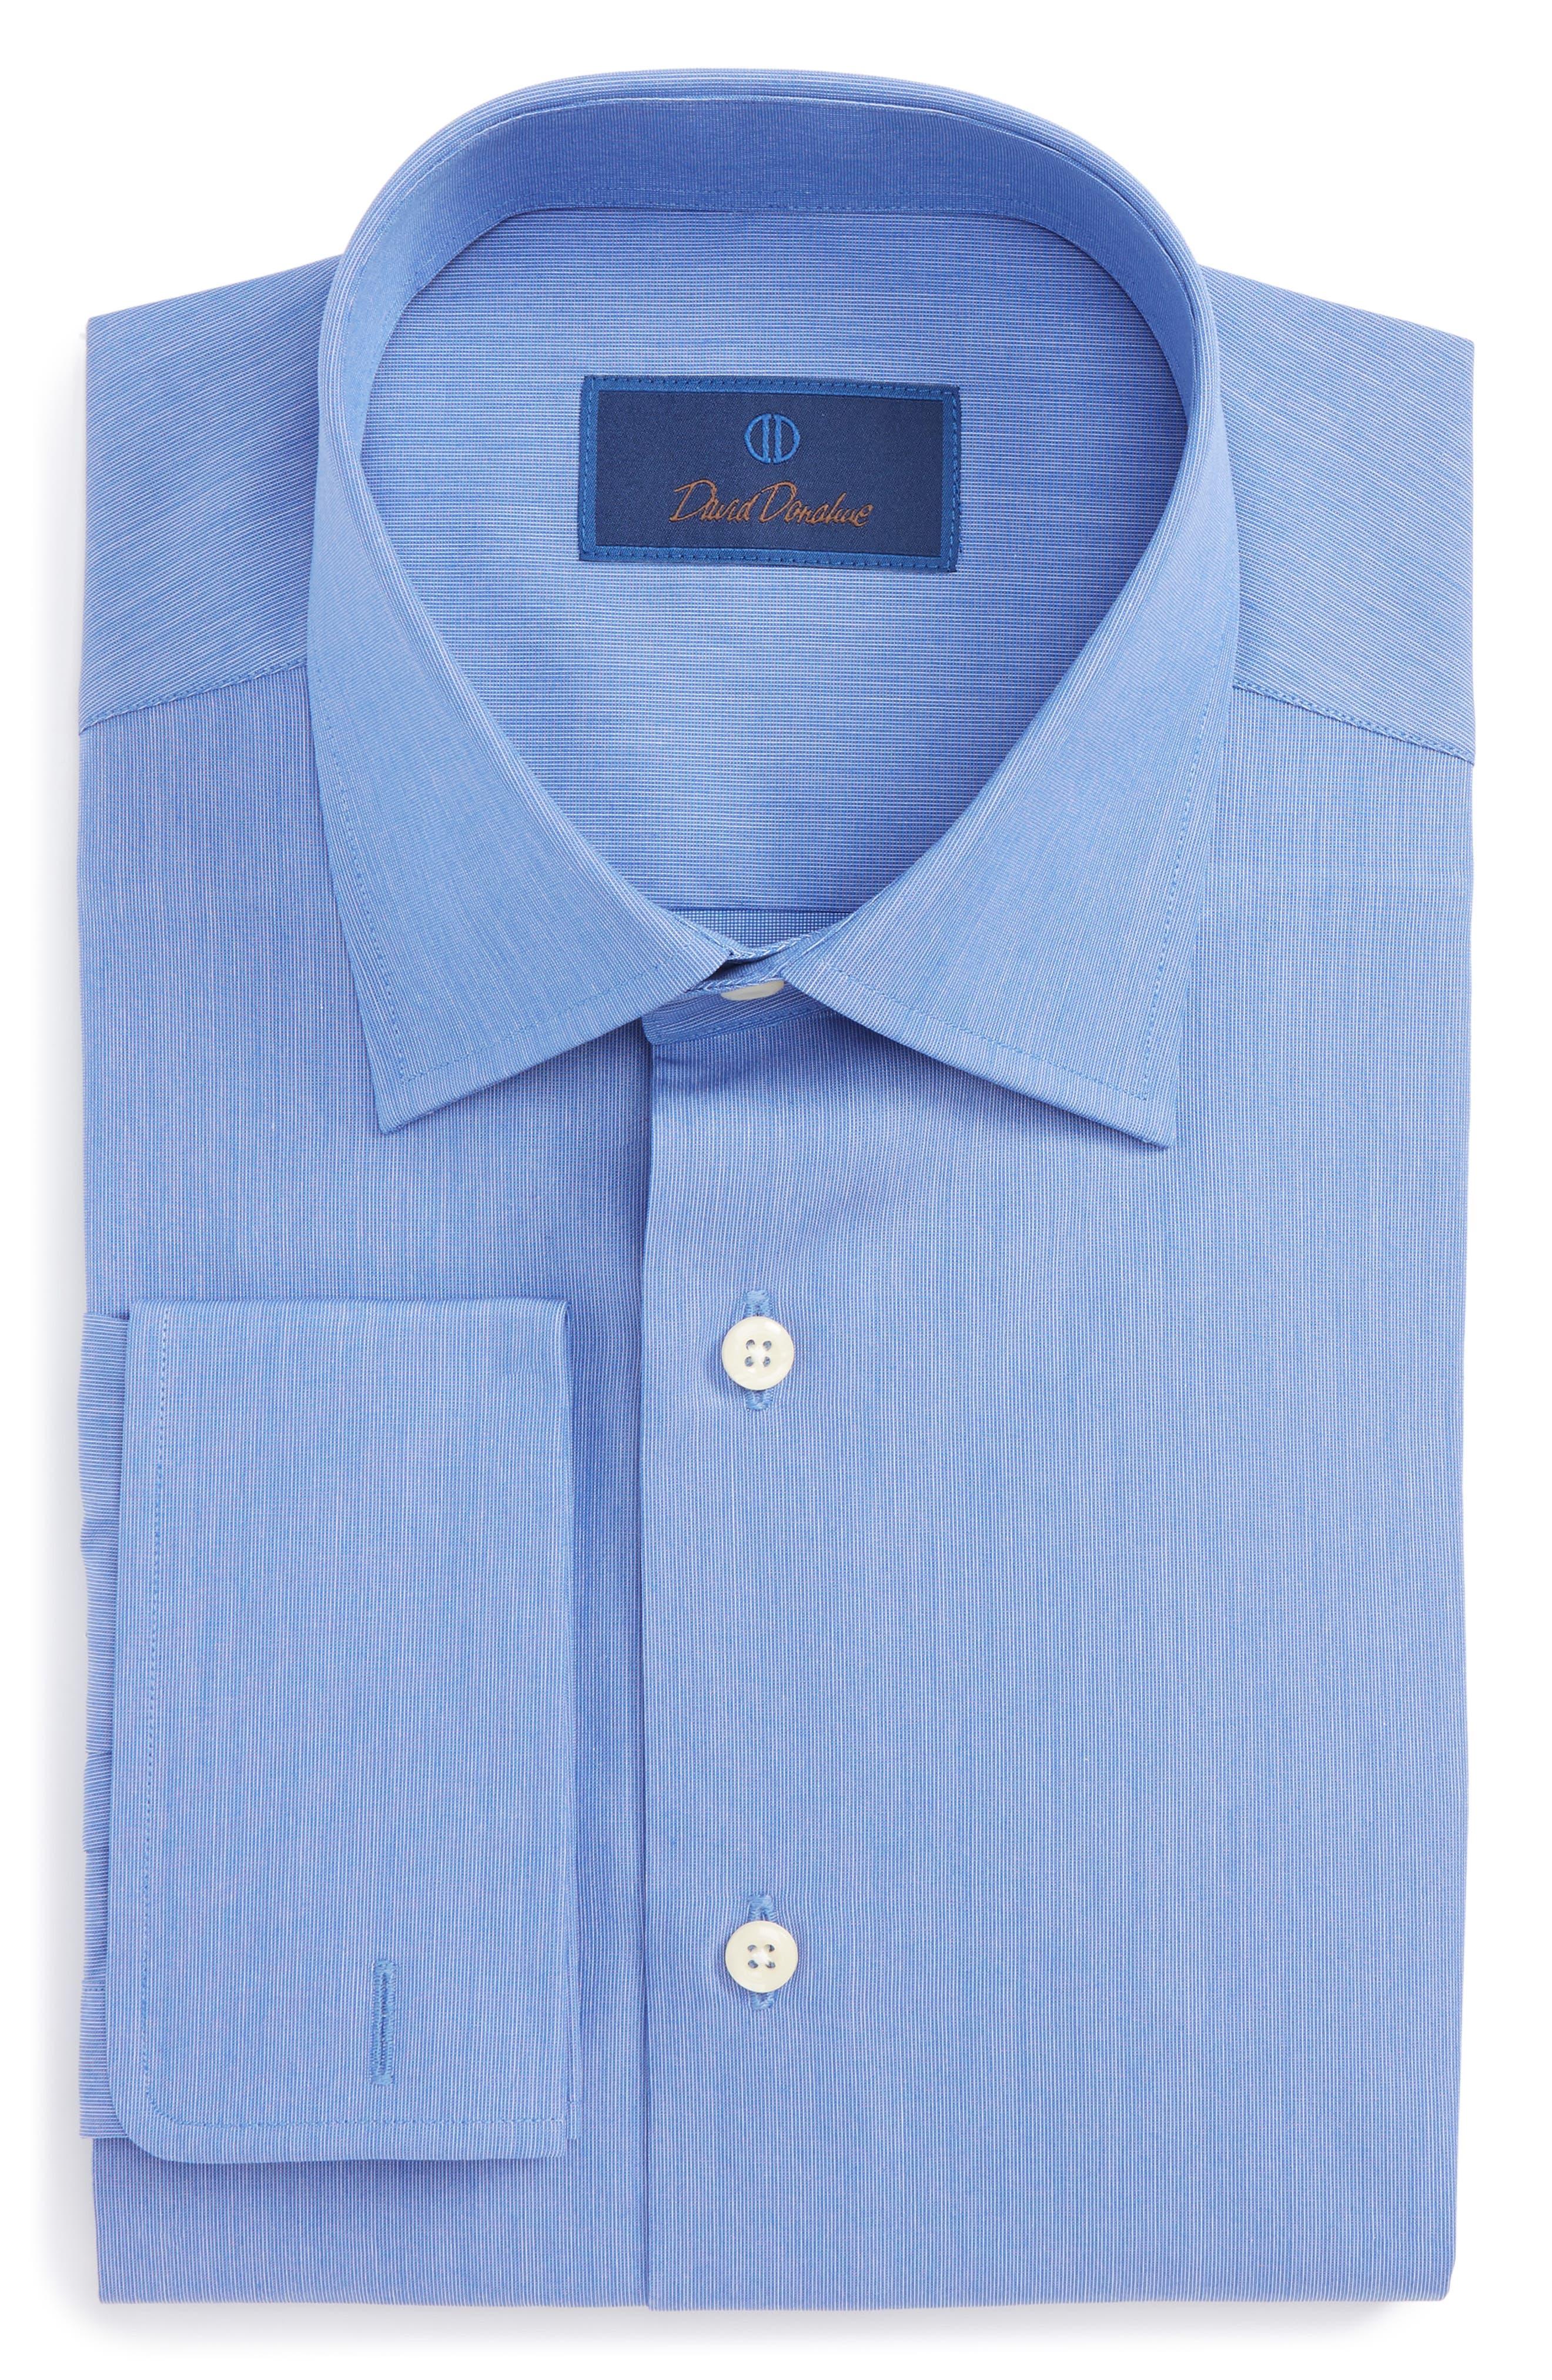 Regular Fit Solid Dress Shirt,                         Main,                         color, 423